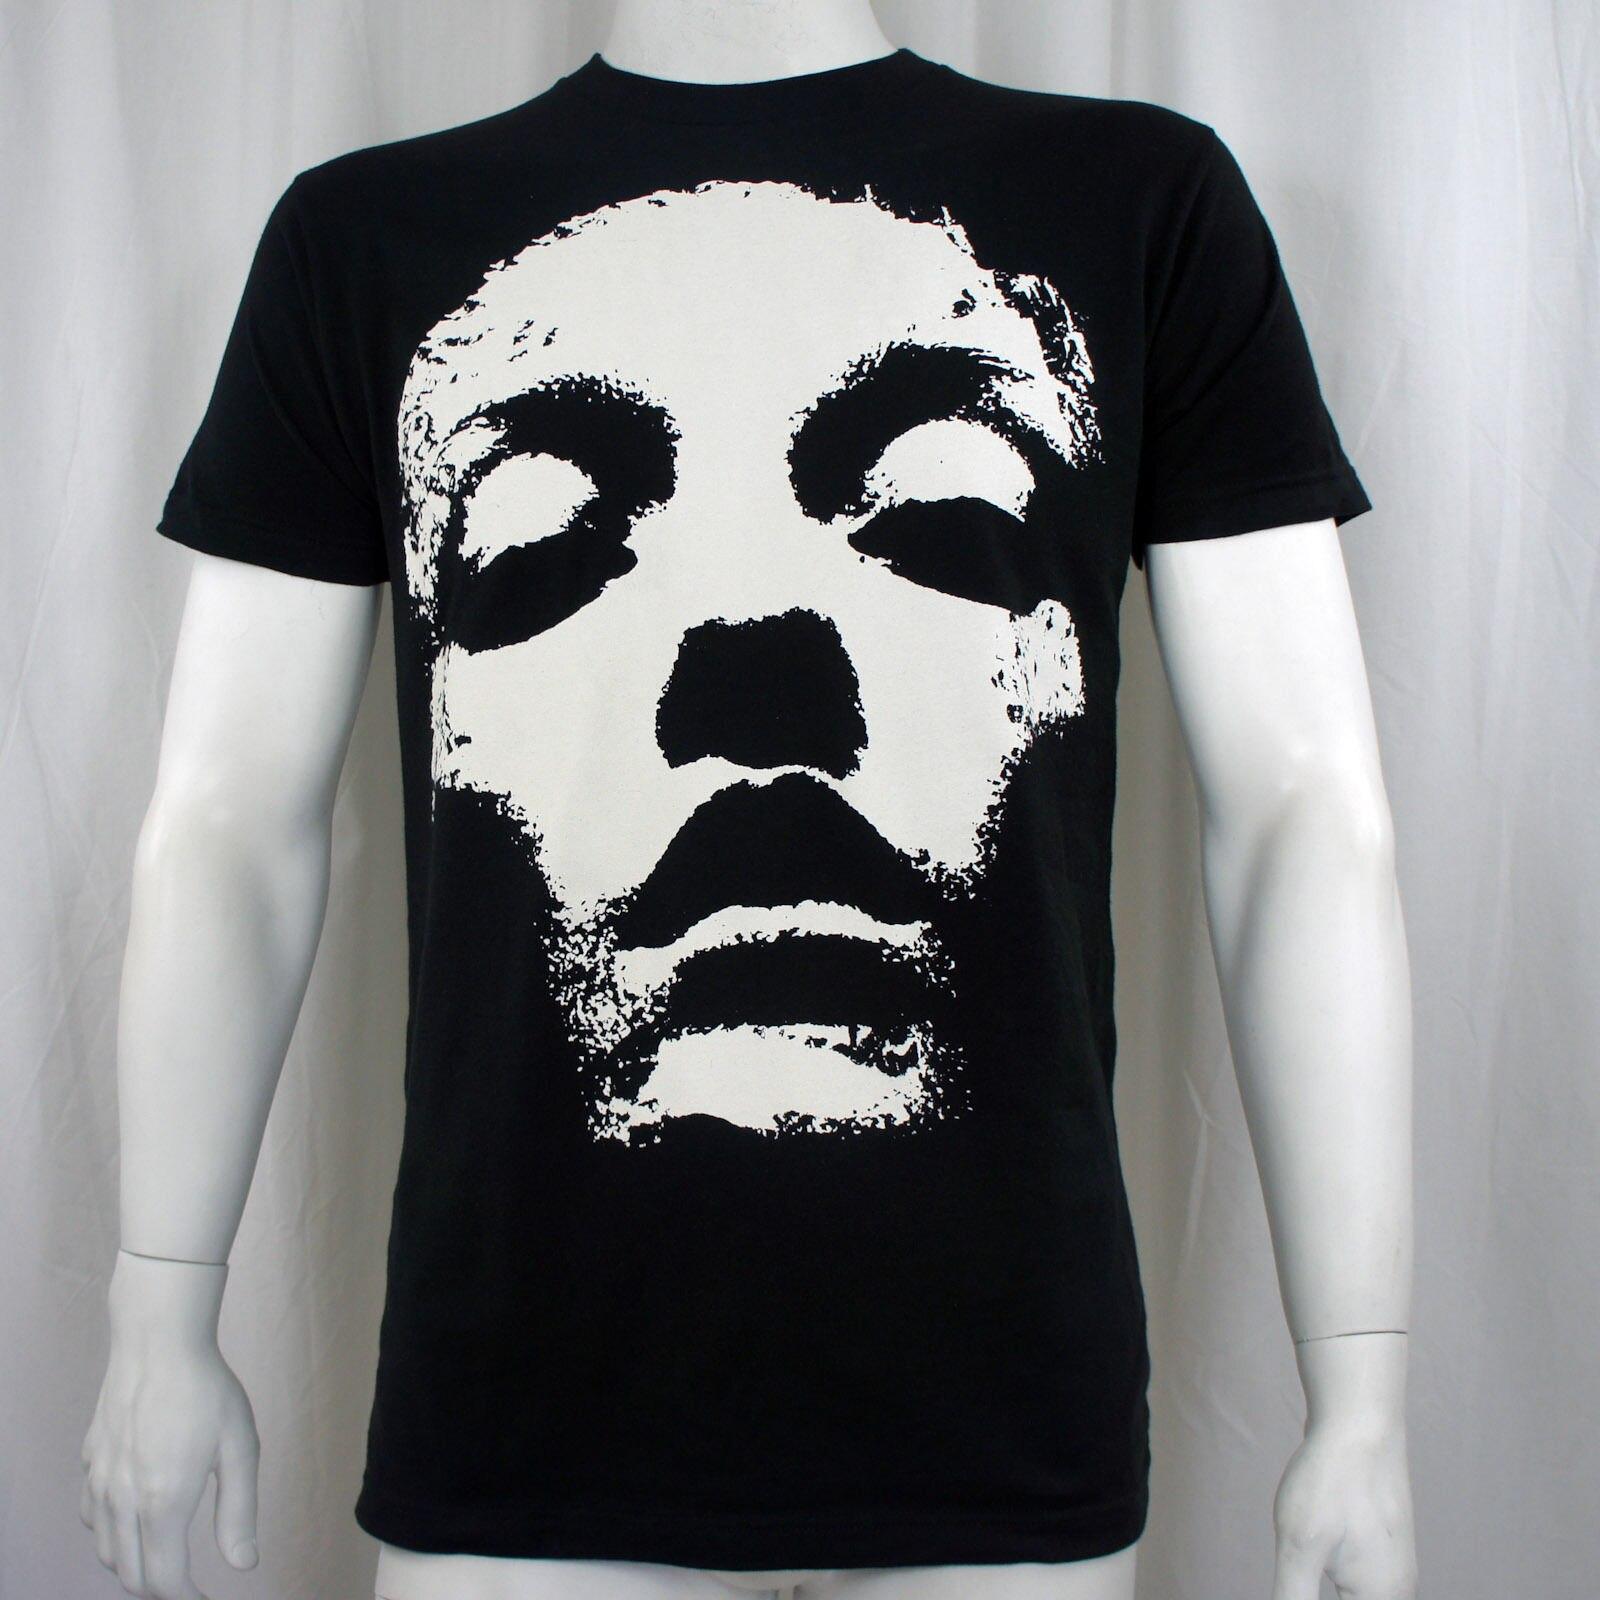 Gildan Authentische KONVERGIEREN Band Jane Doe Album Cover Slim Fit T-Shirt Sml...